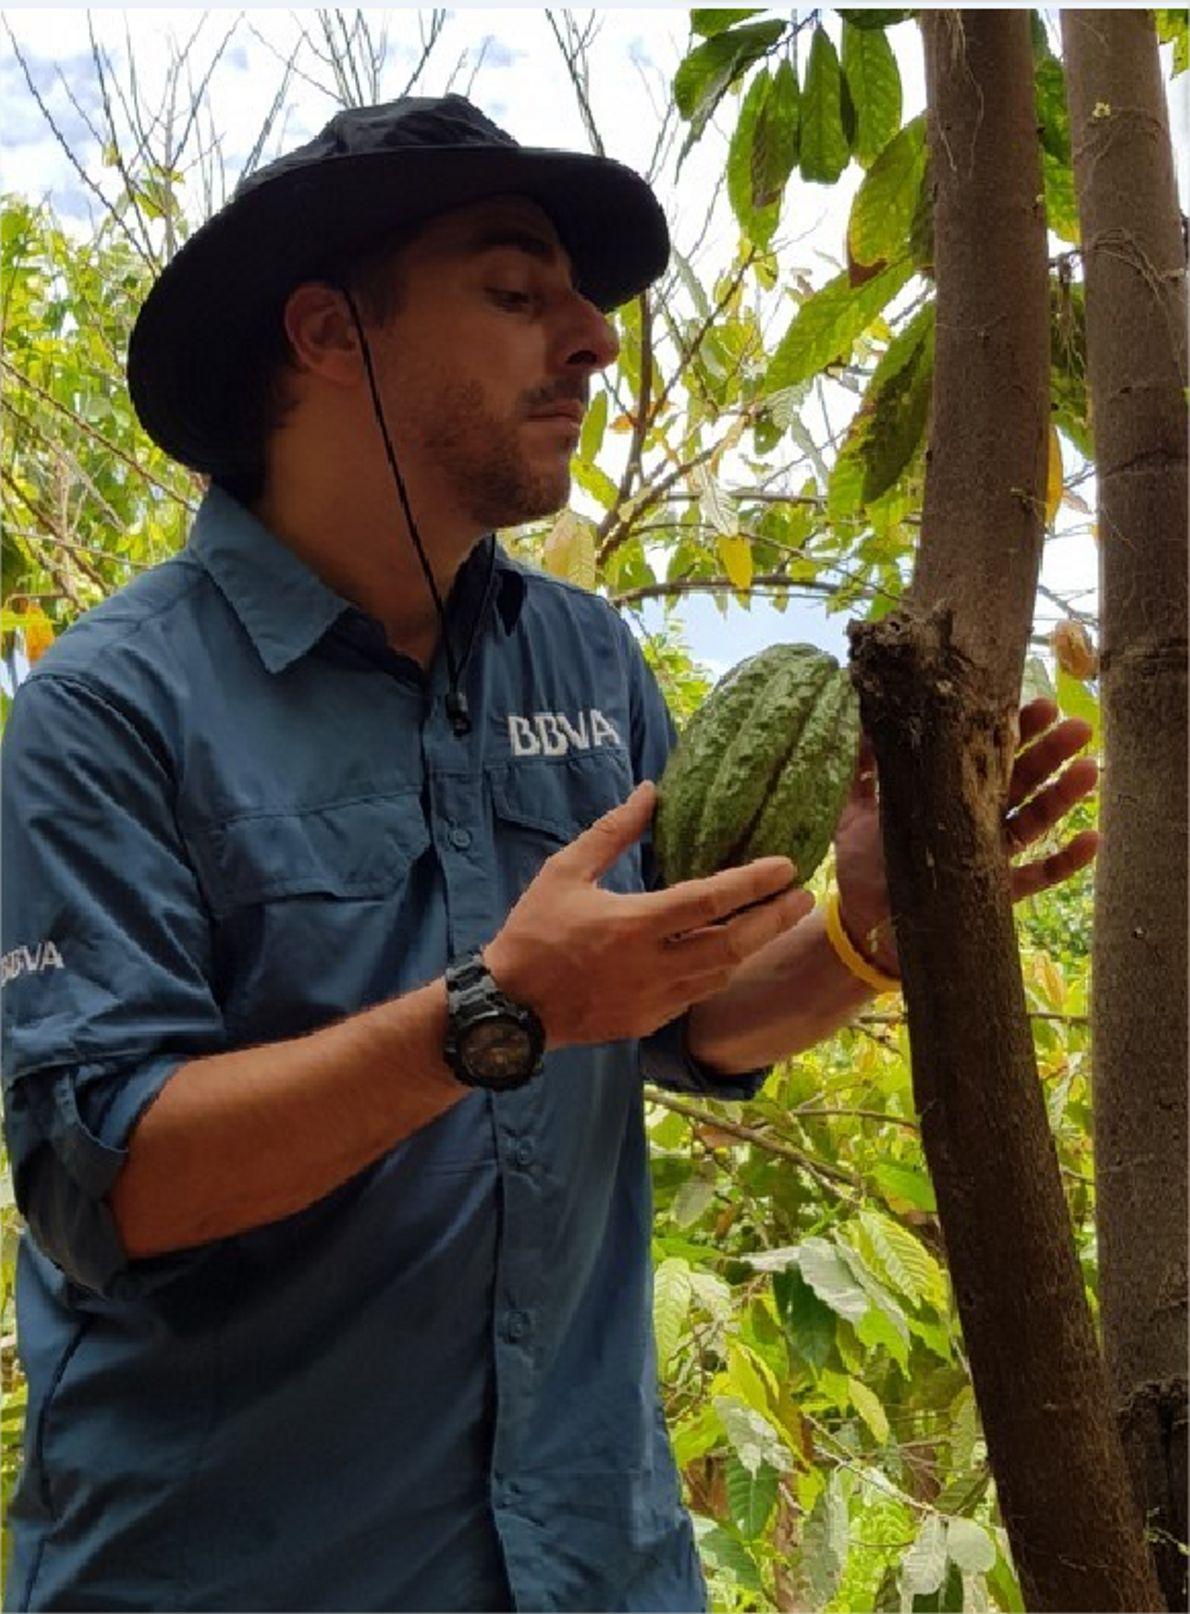 Observando granos de cacao